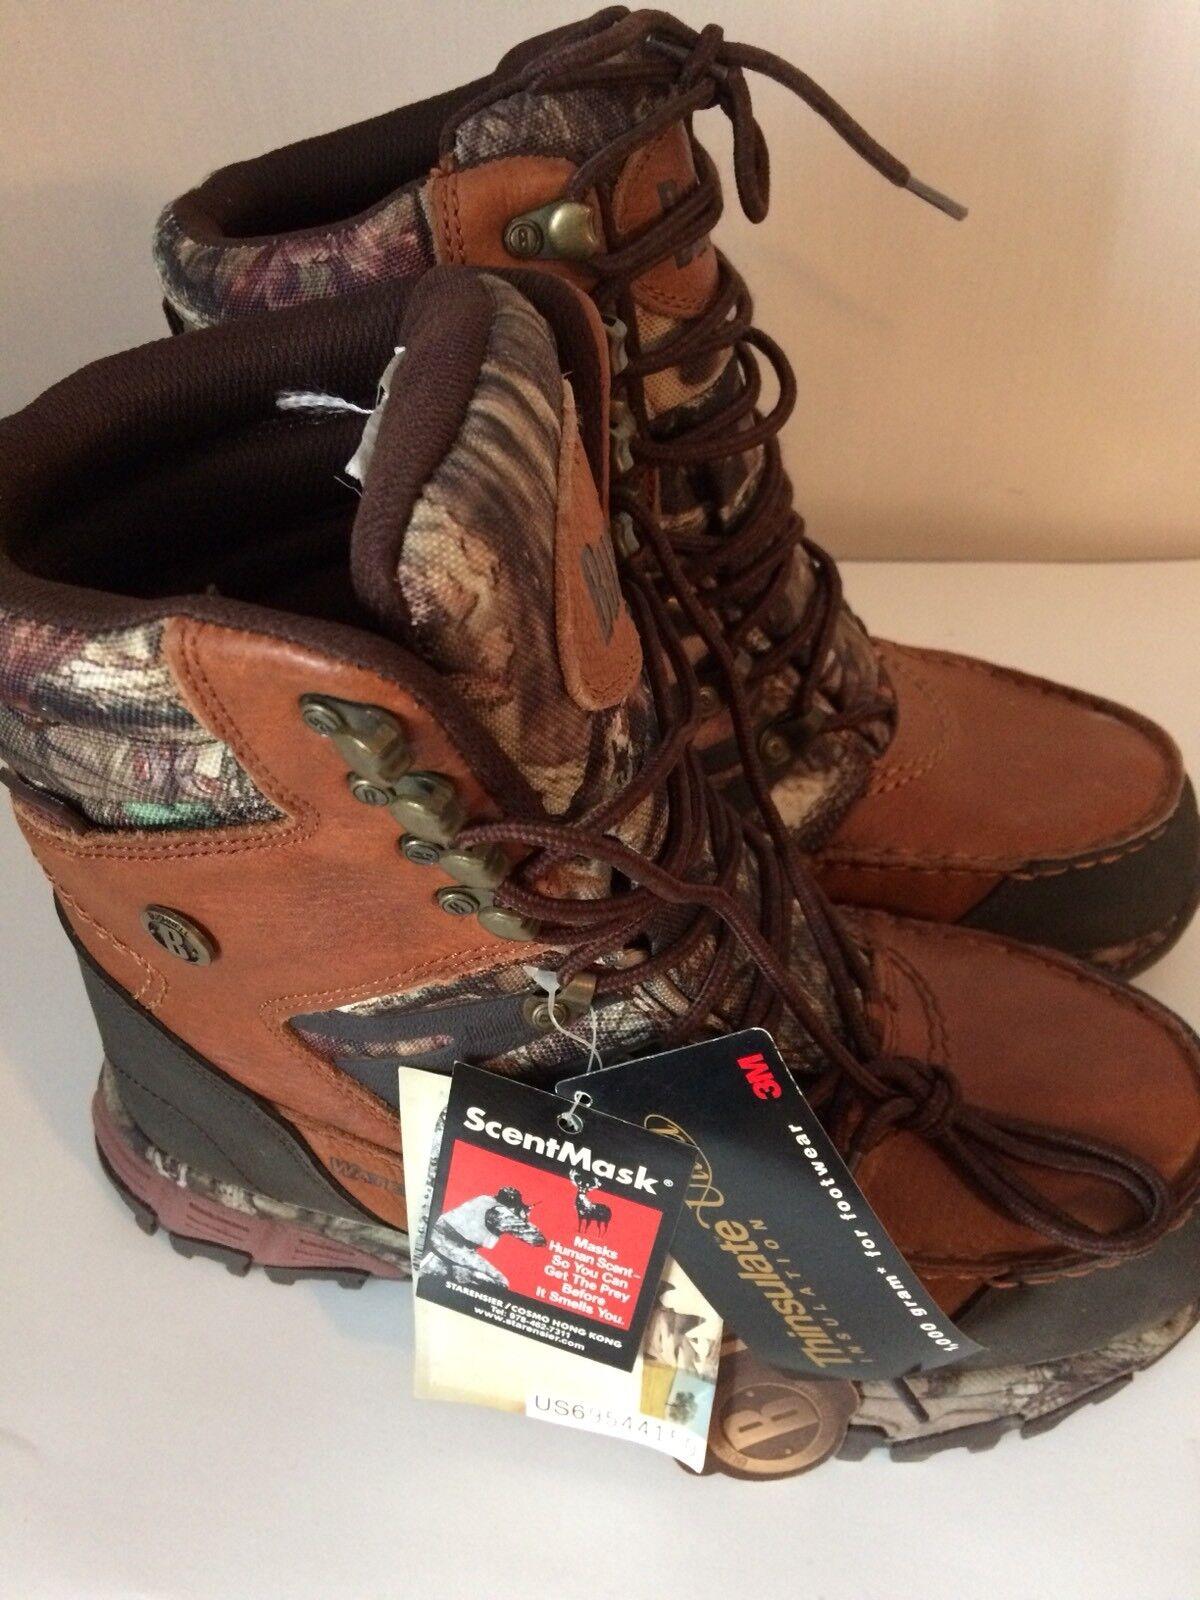 Mossy Oak Bushnell  Mens braun Waterproof ScentMask Stiefel Stiefel Stiefel Thinsulate NWT 8M 9becb8